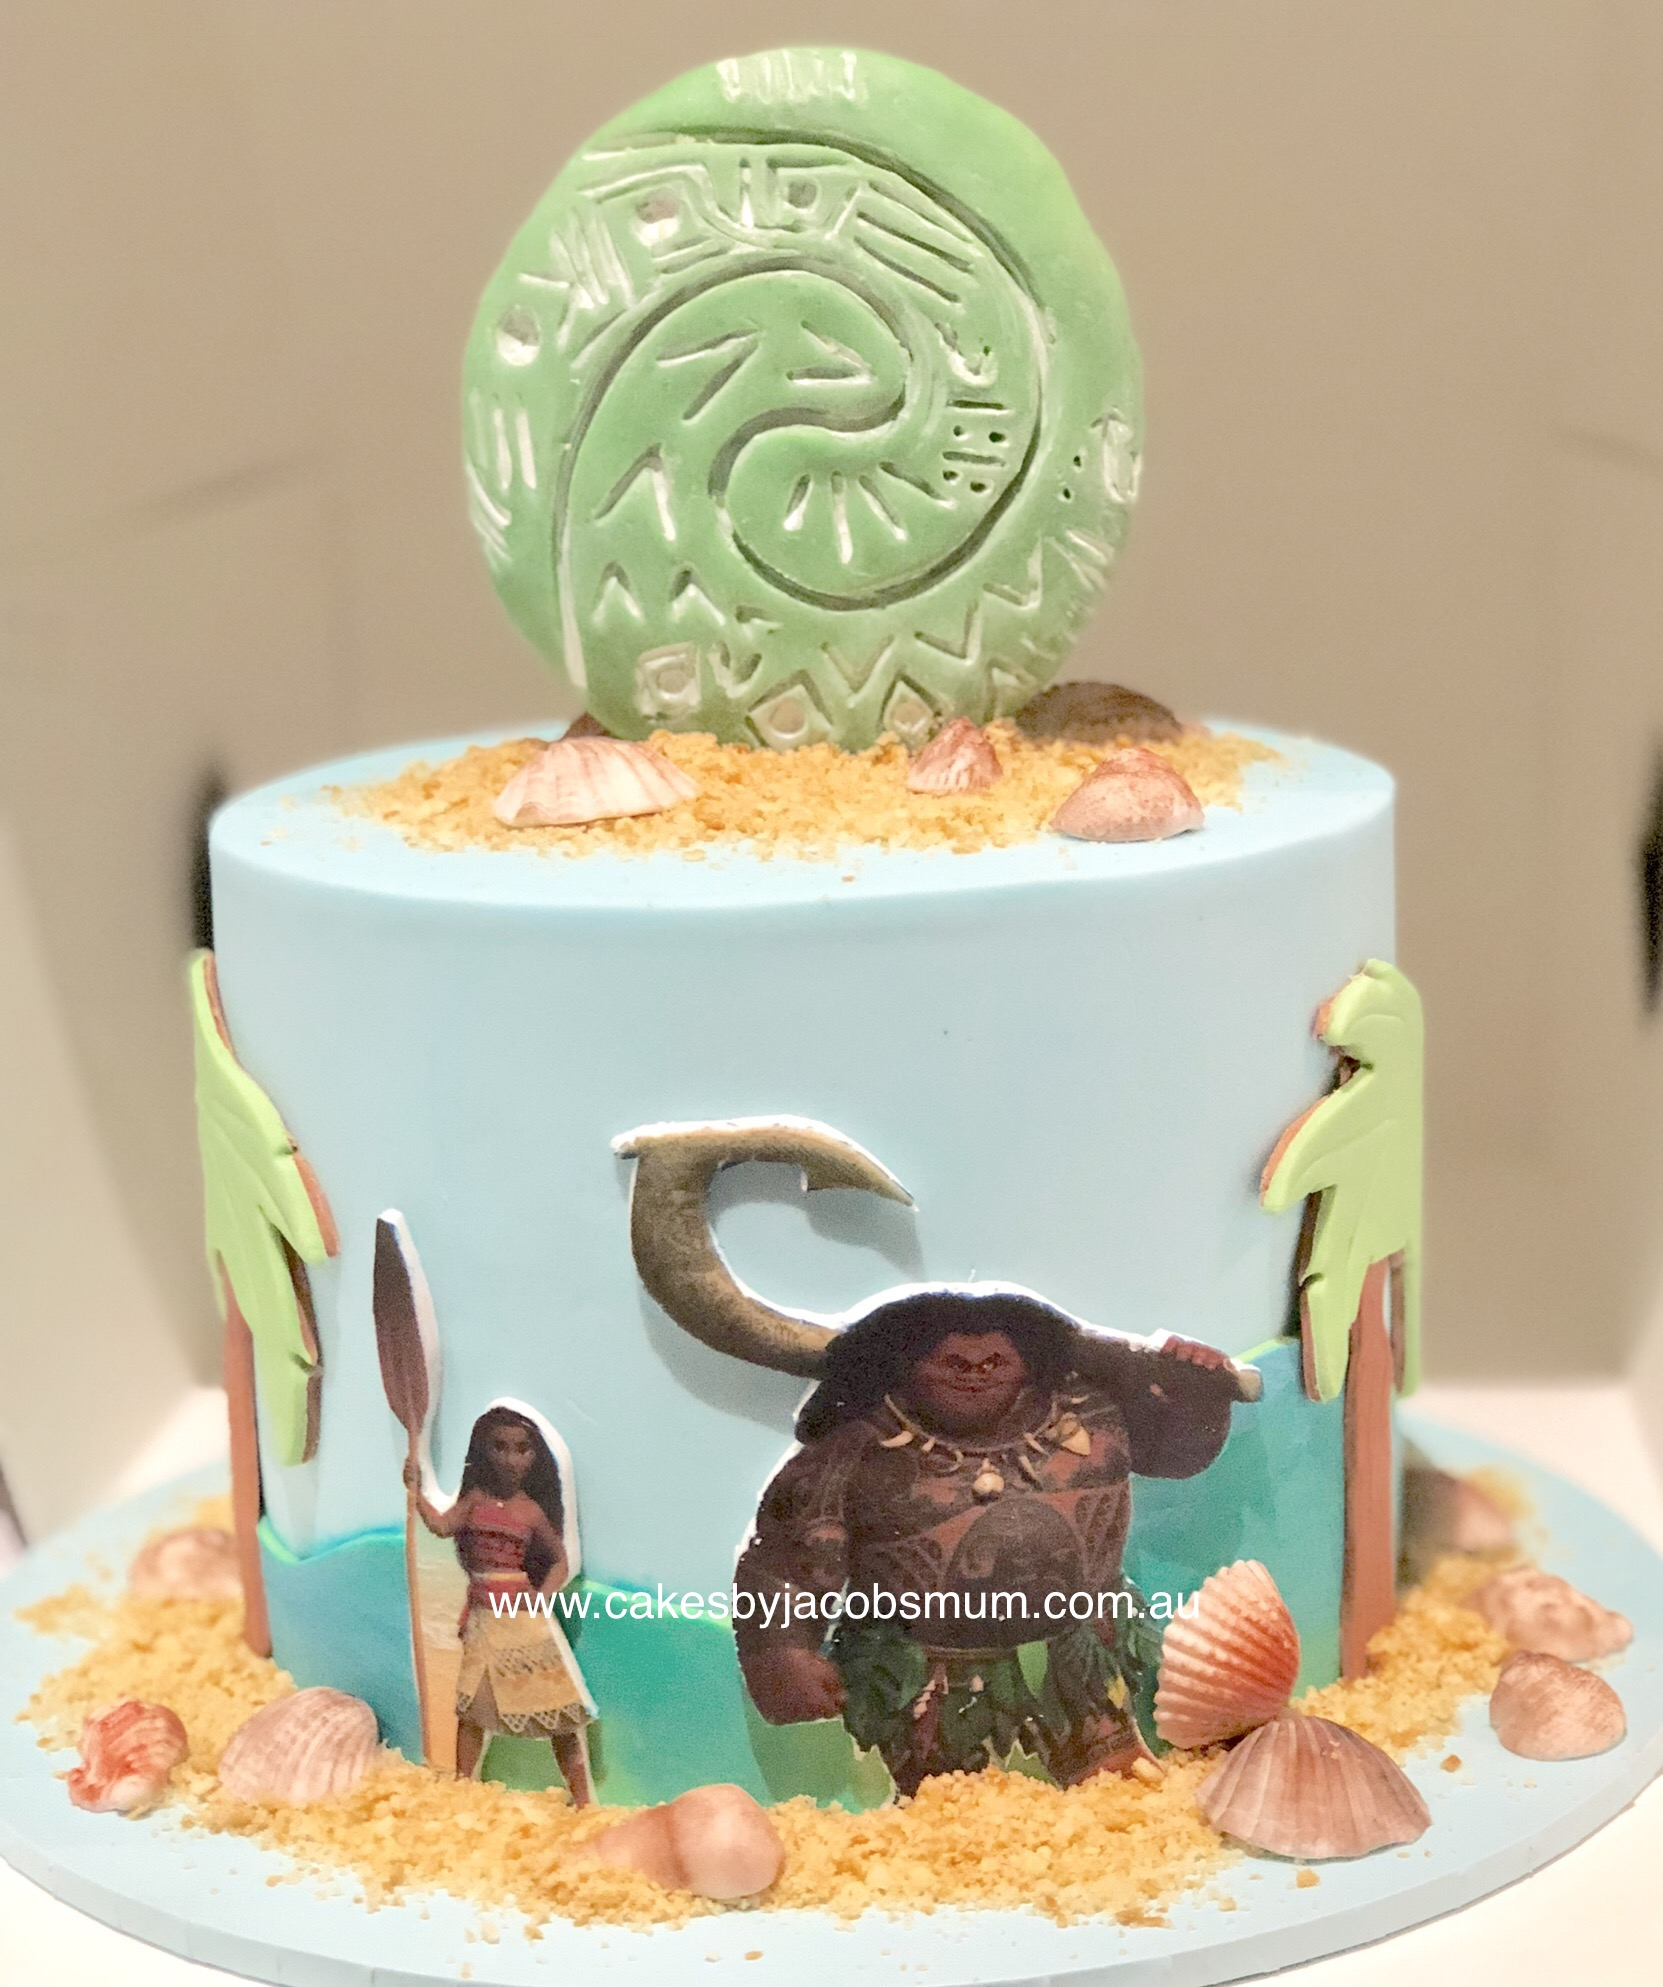 Moana Maui Heart of Te Fiti Cake